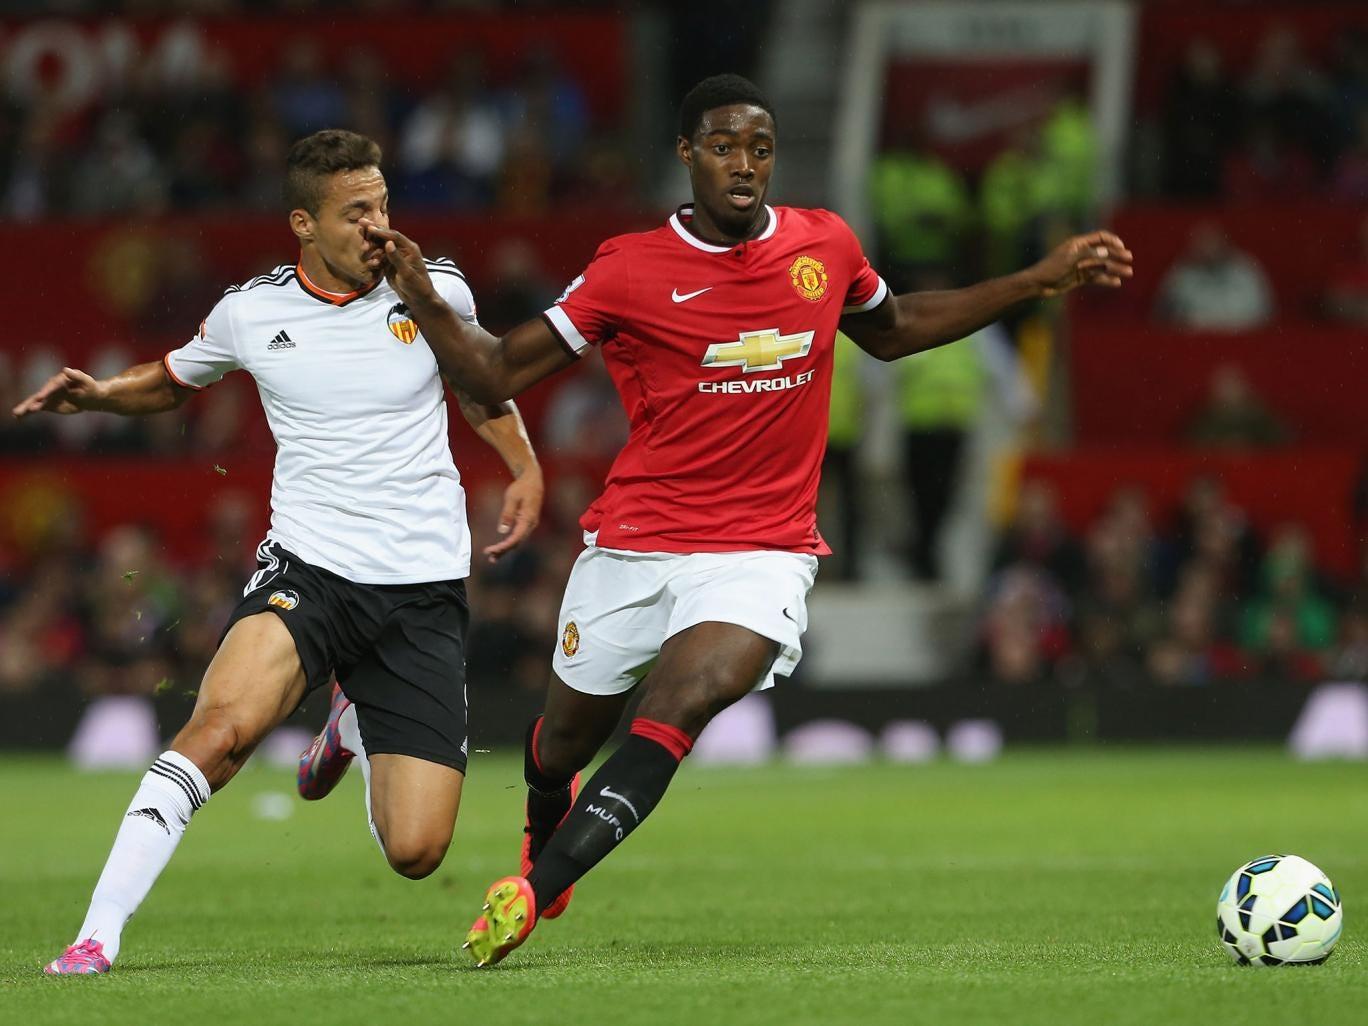 Tyler Blackett will make his Manchester United debut against Swansea